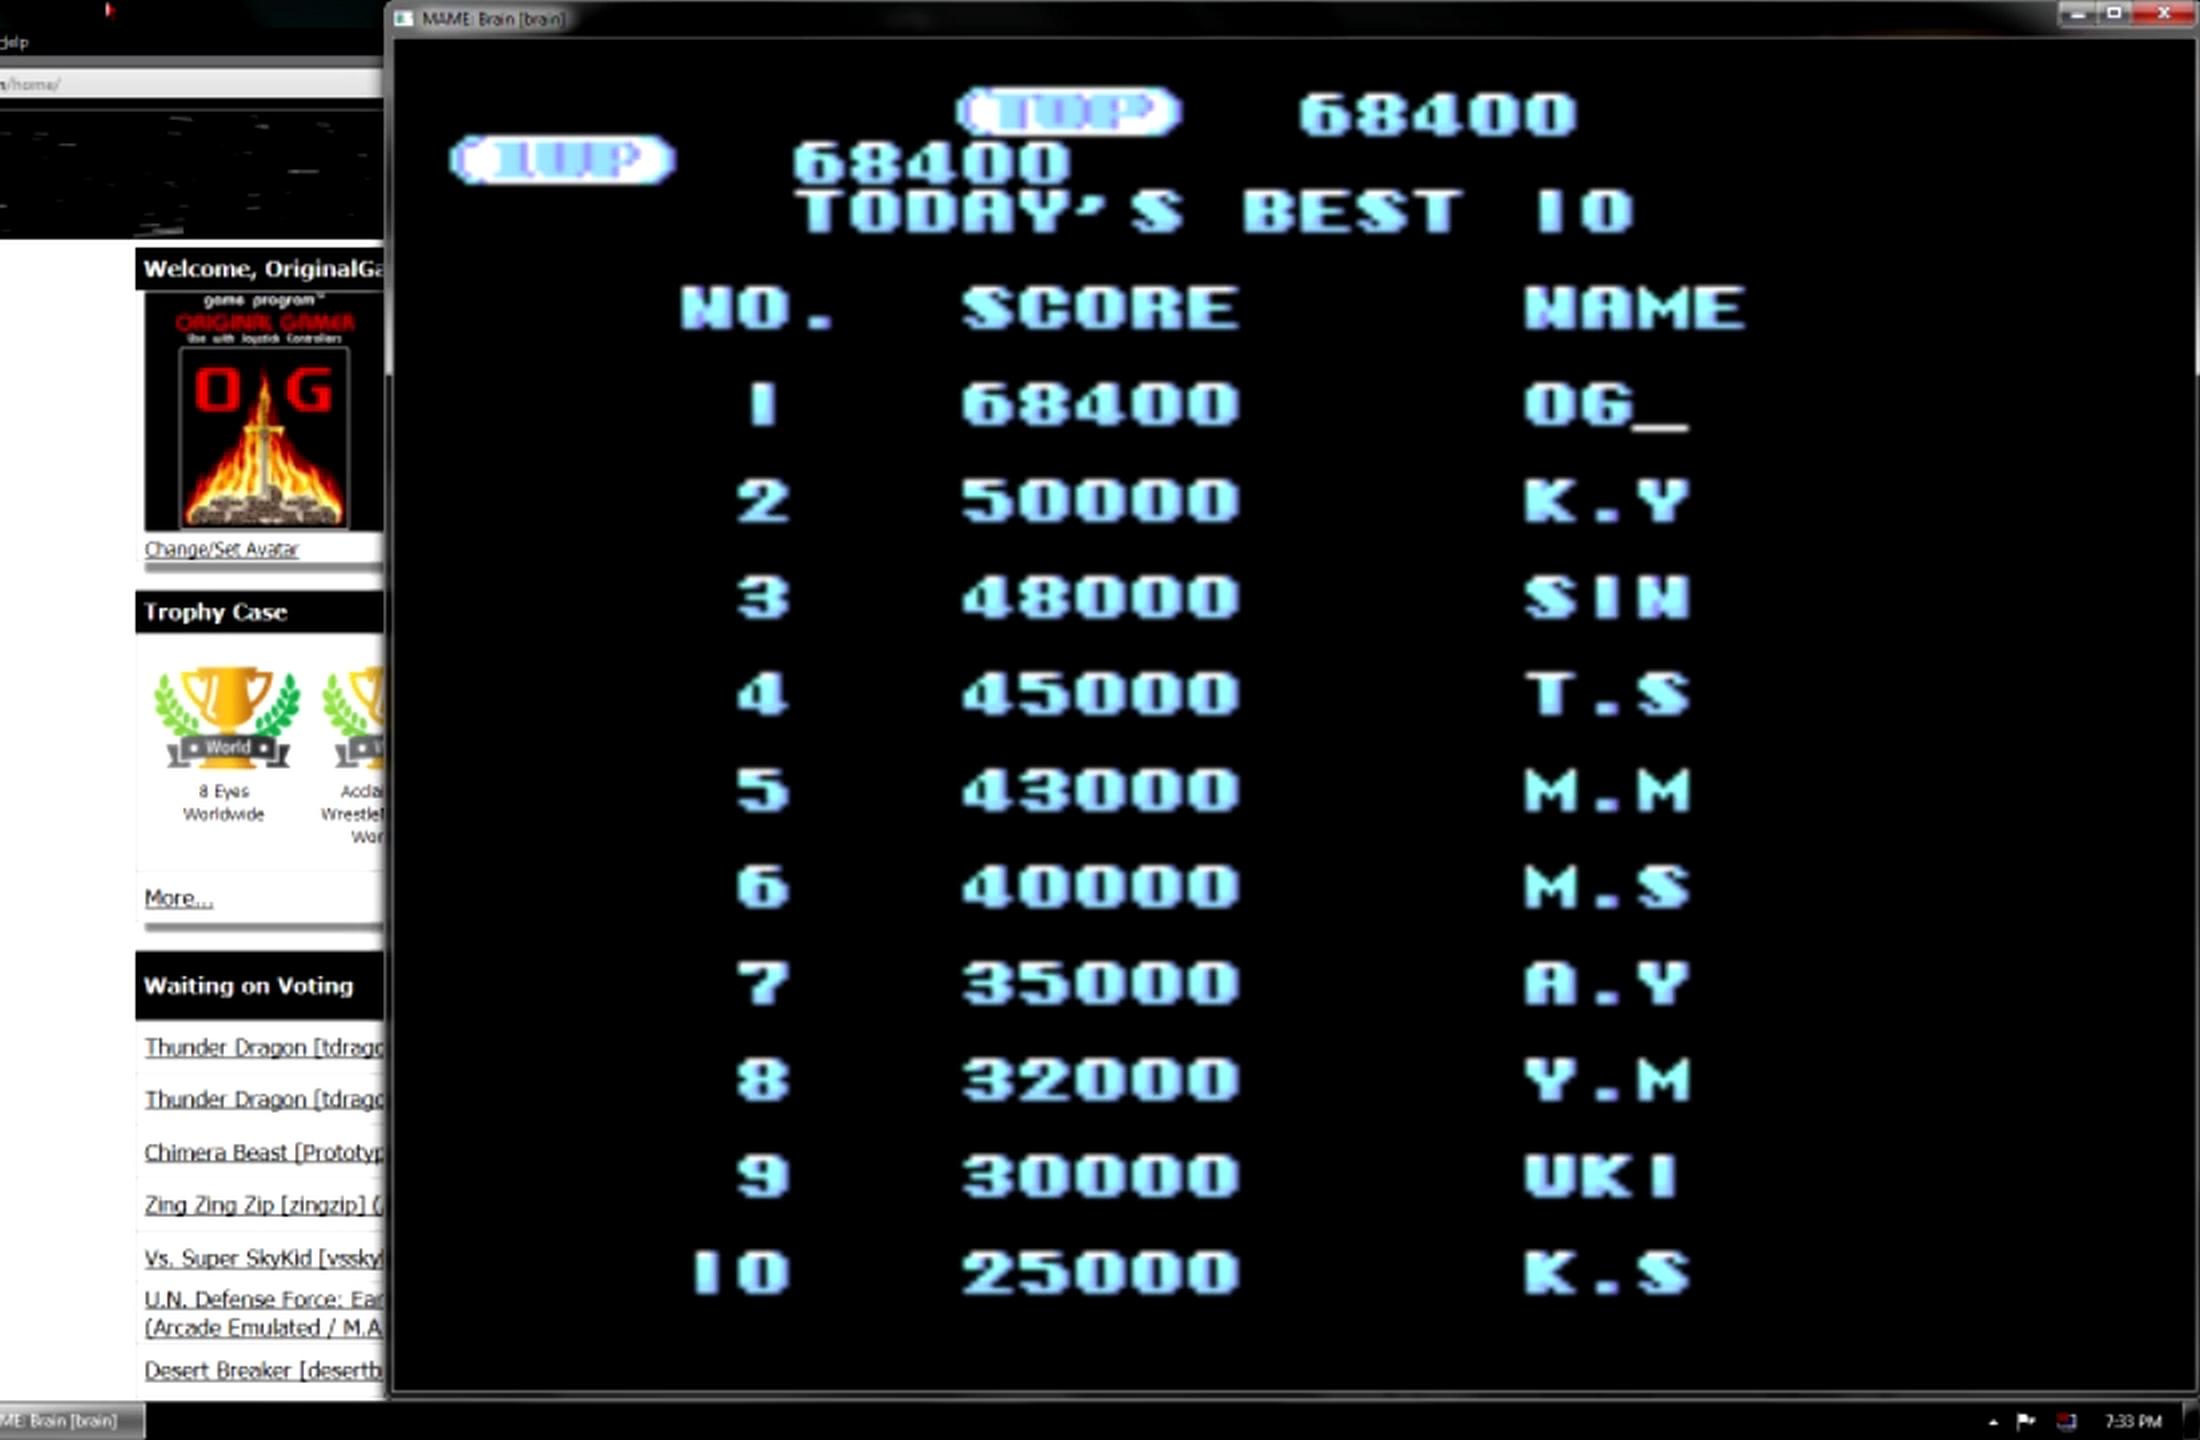 OriginalGamer: Brain [brain] (Arcade Emulated / M.A.M.E.) 68,400 points on 2015-05-30 23:32:36